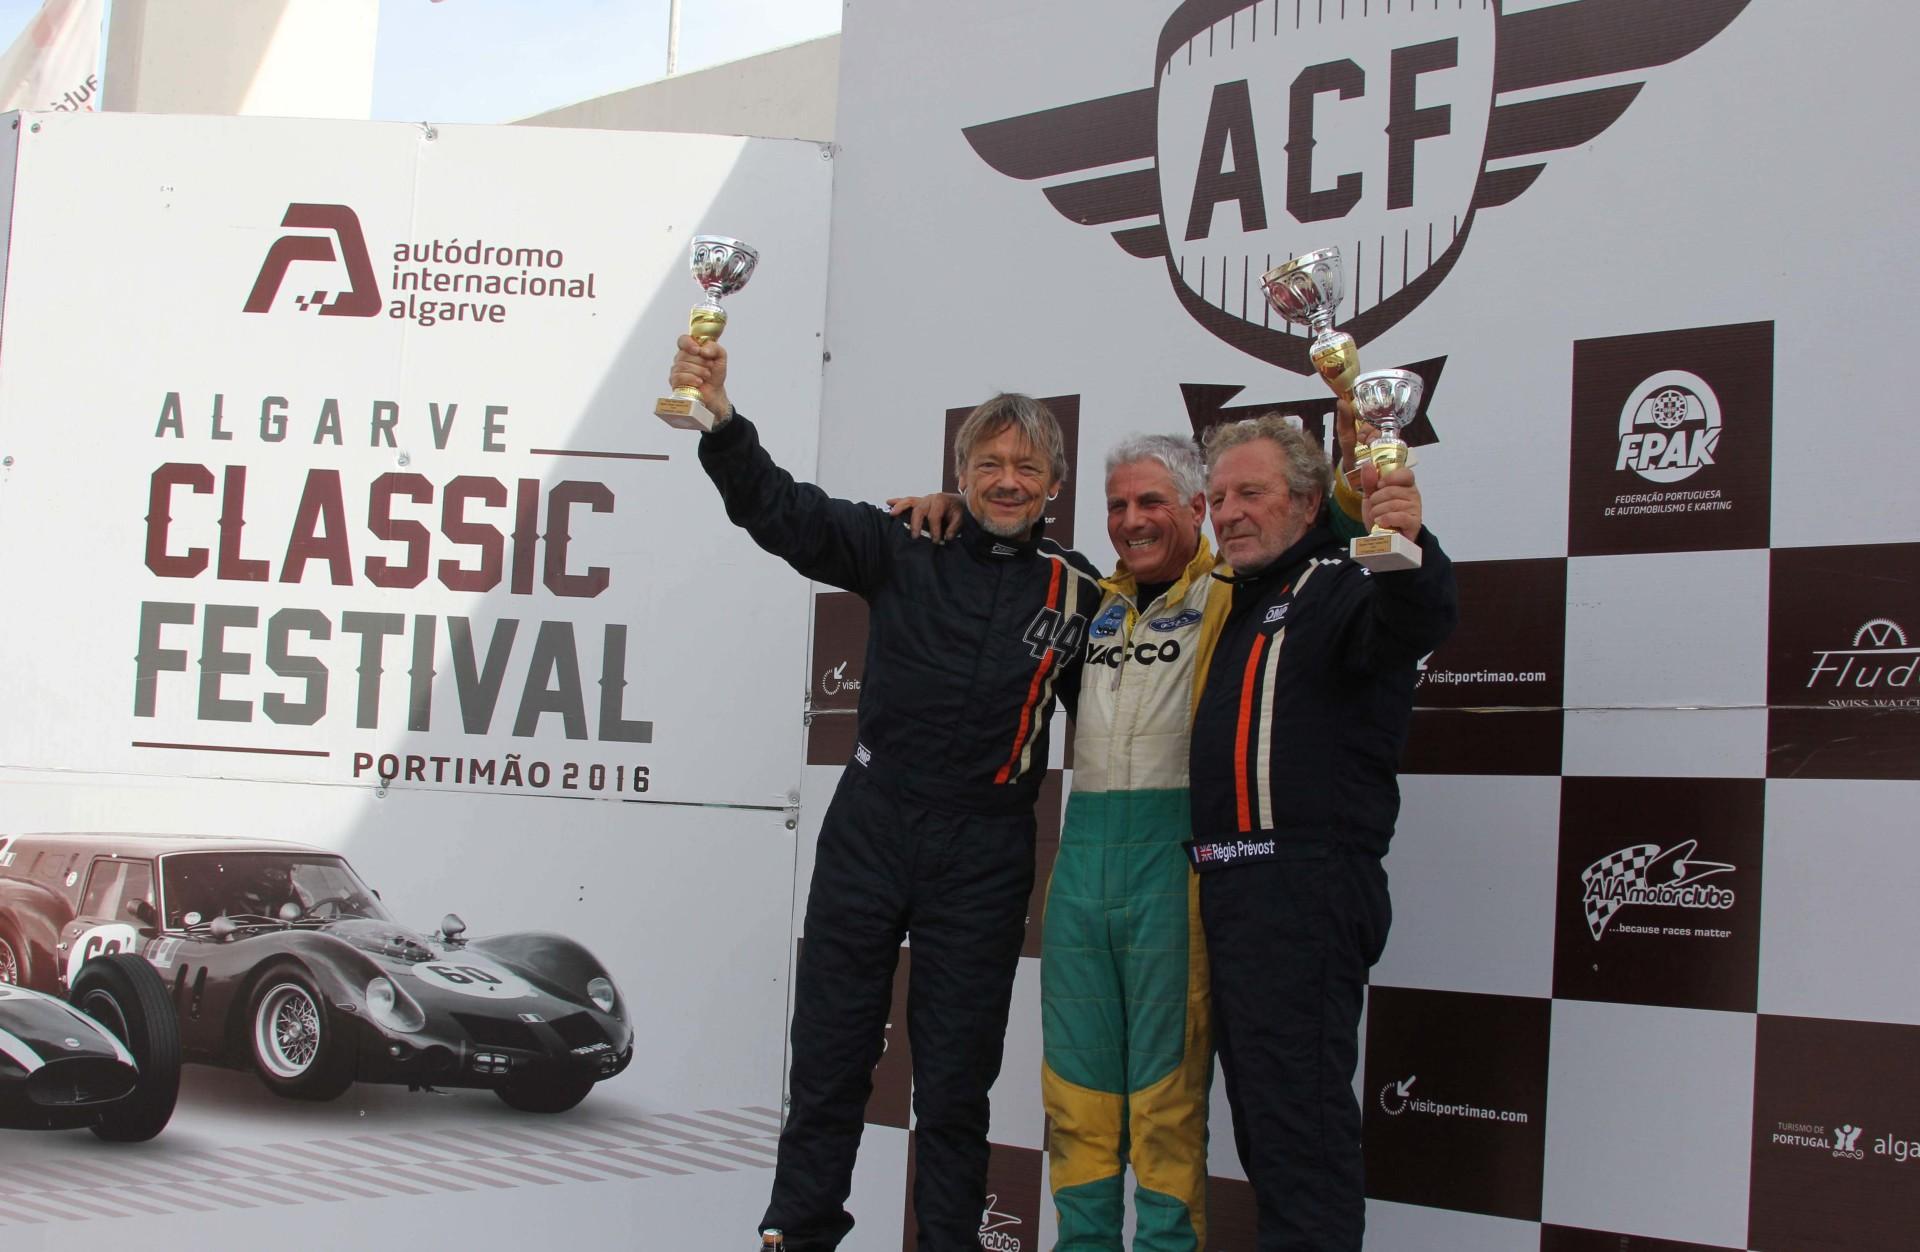 raceready-sss-algarve-classic-festival-2016foto-ampaquete-61